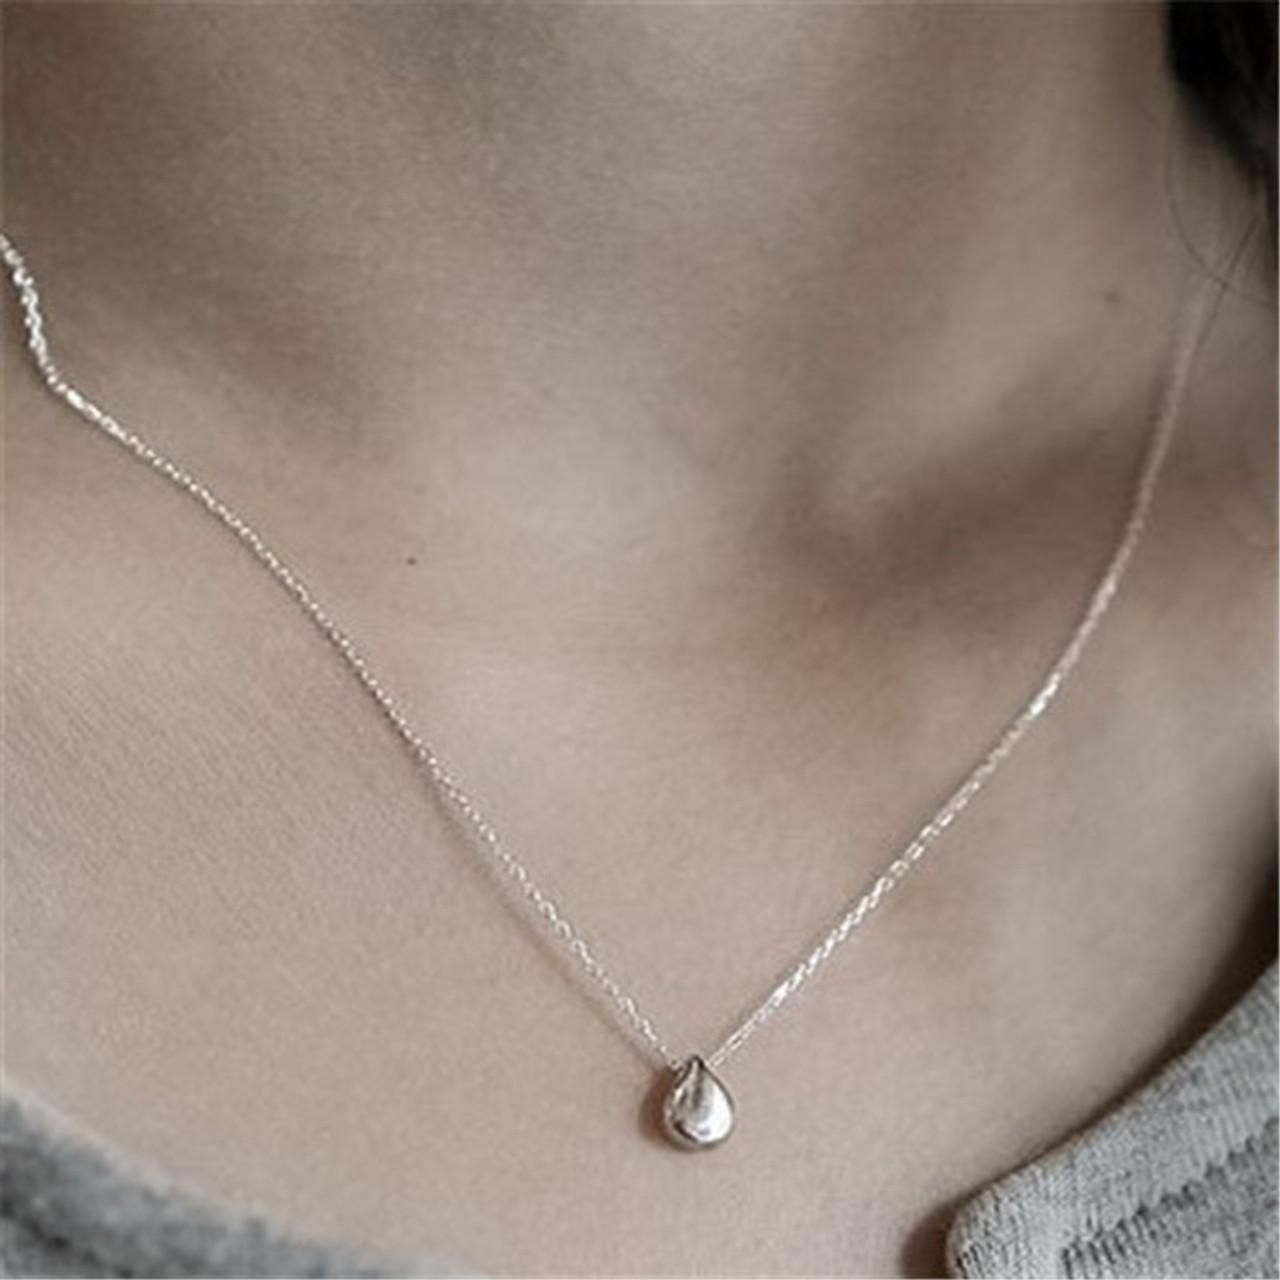 Jsping 925 Sterling Silver Necklace Amp Pendants Simple Design